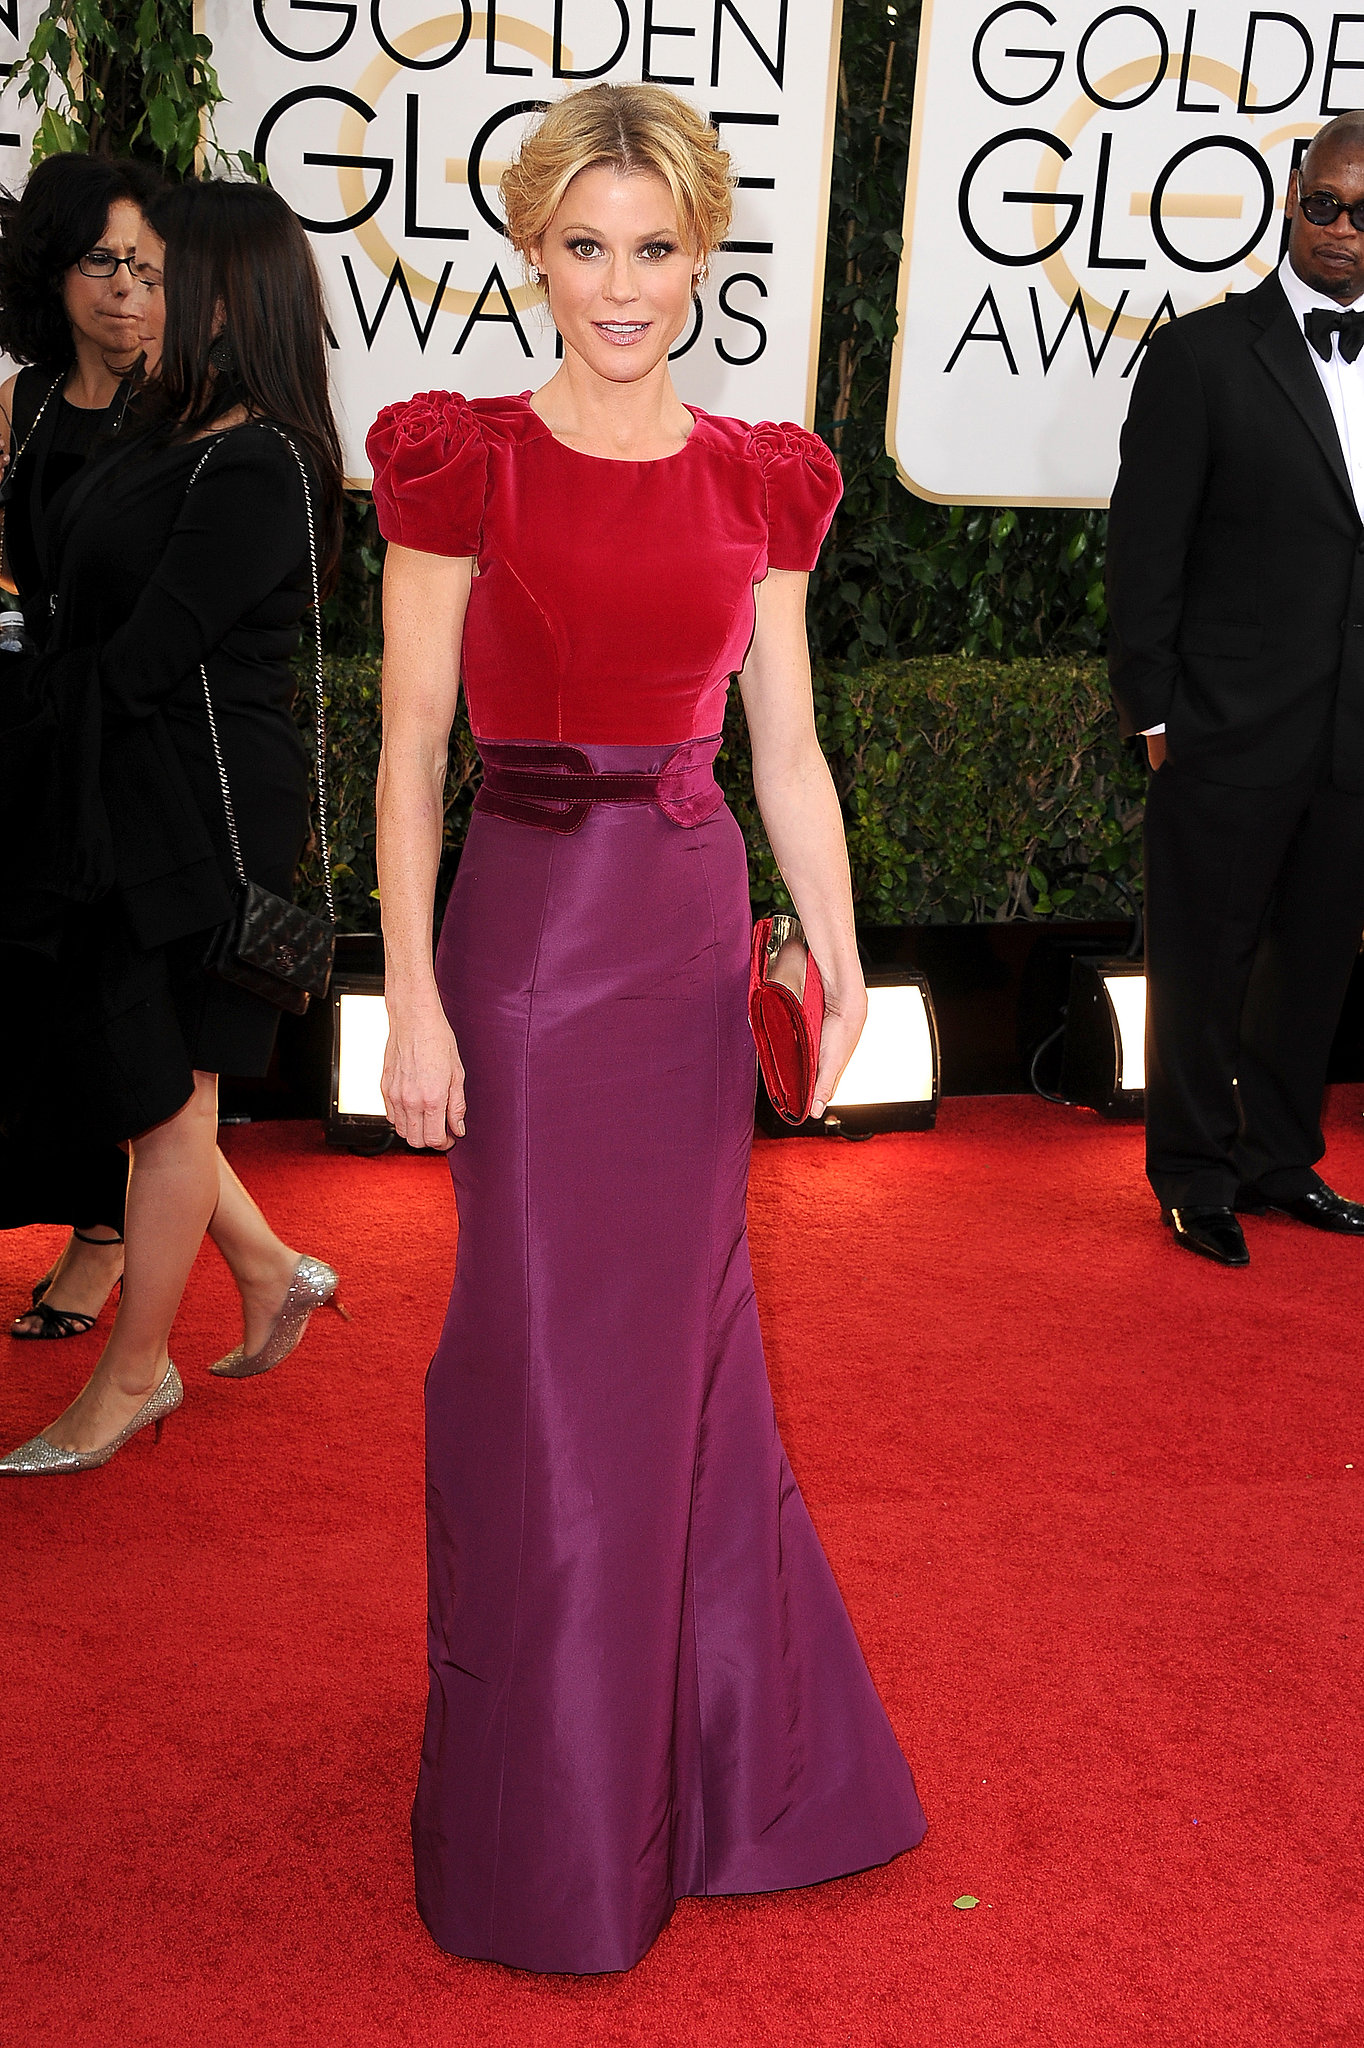 Julie Bowen, of Modern Family-fame, hit the red carpet.